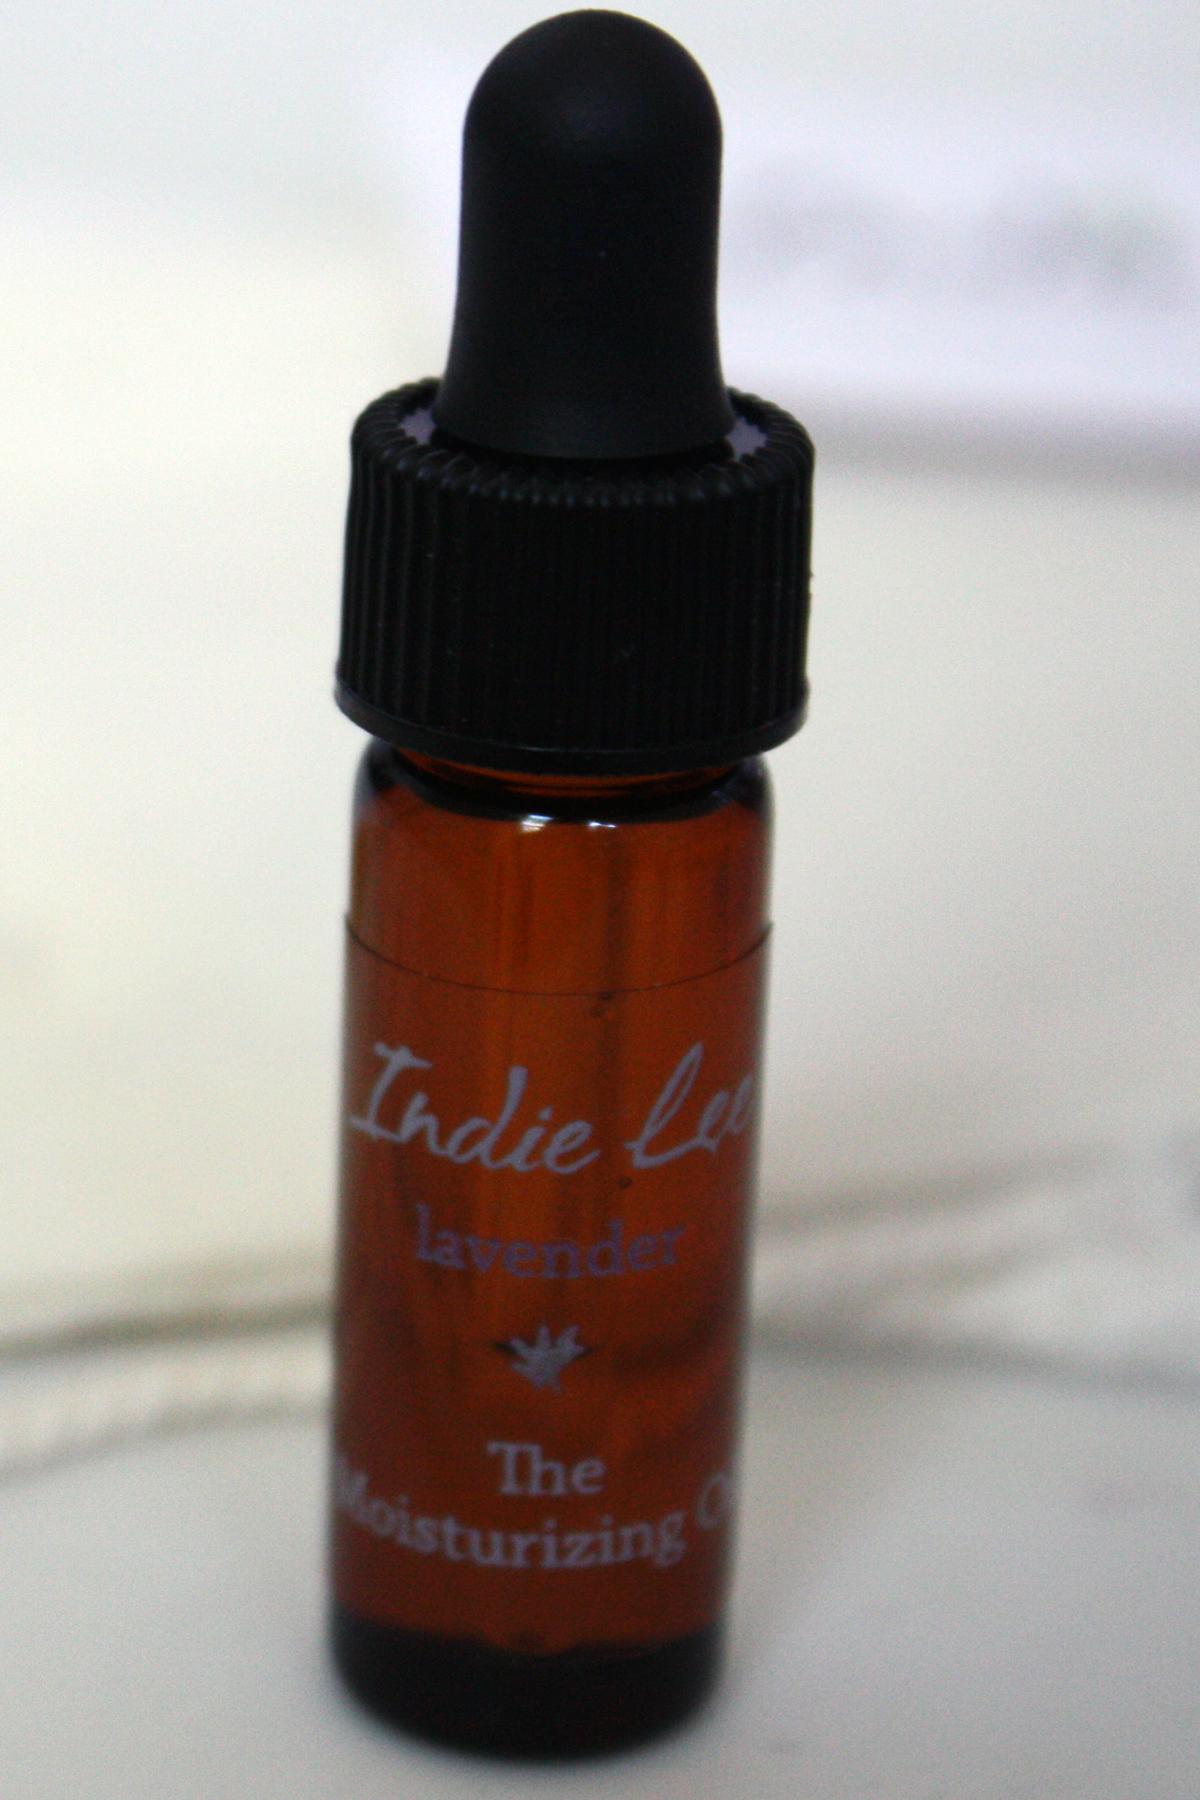 Indie Lee Natural Skincare Samples